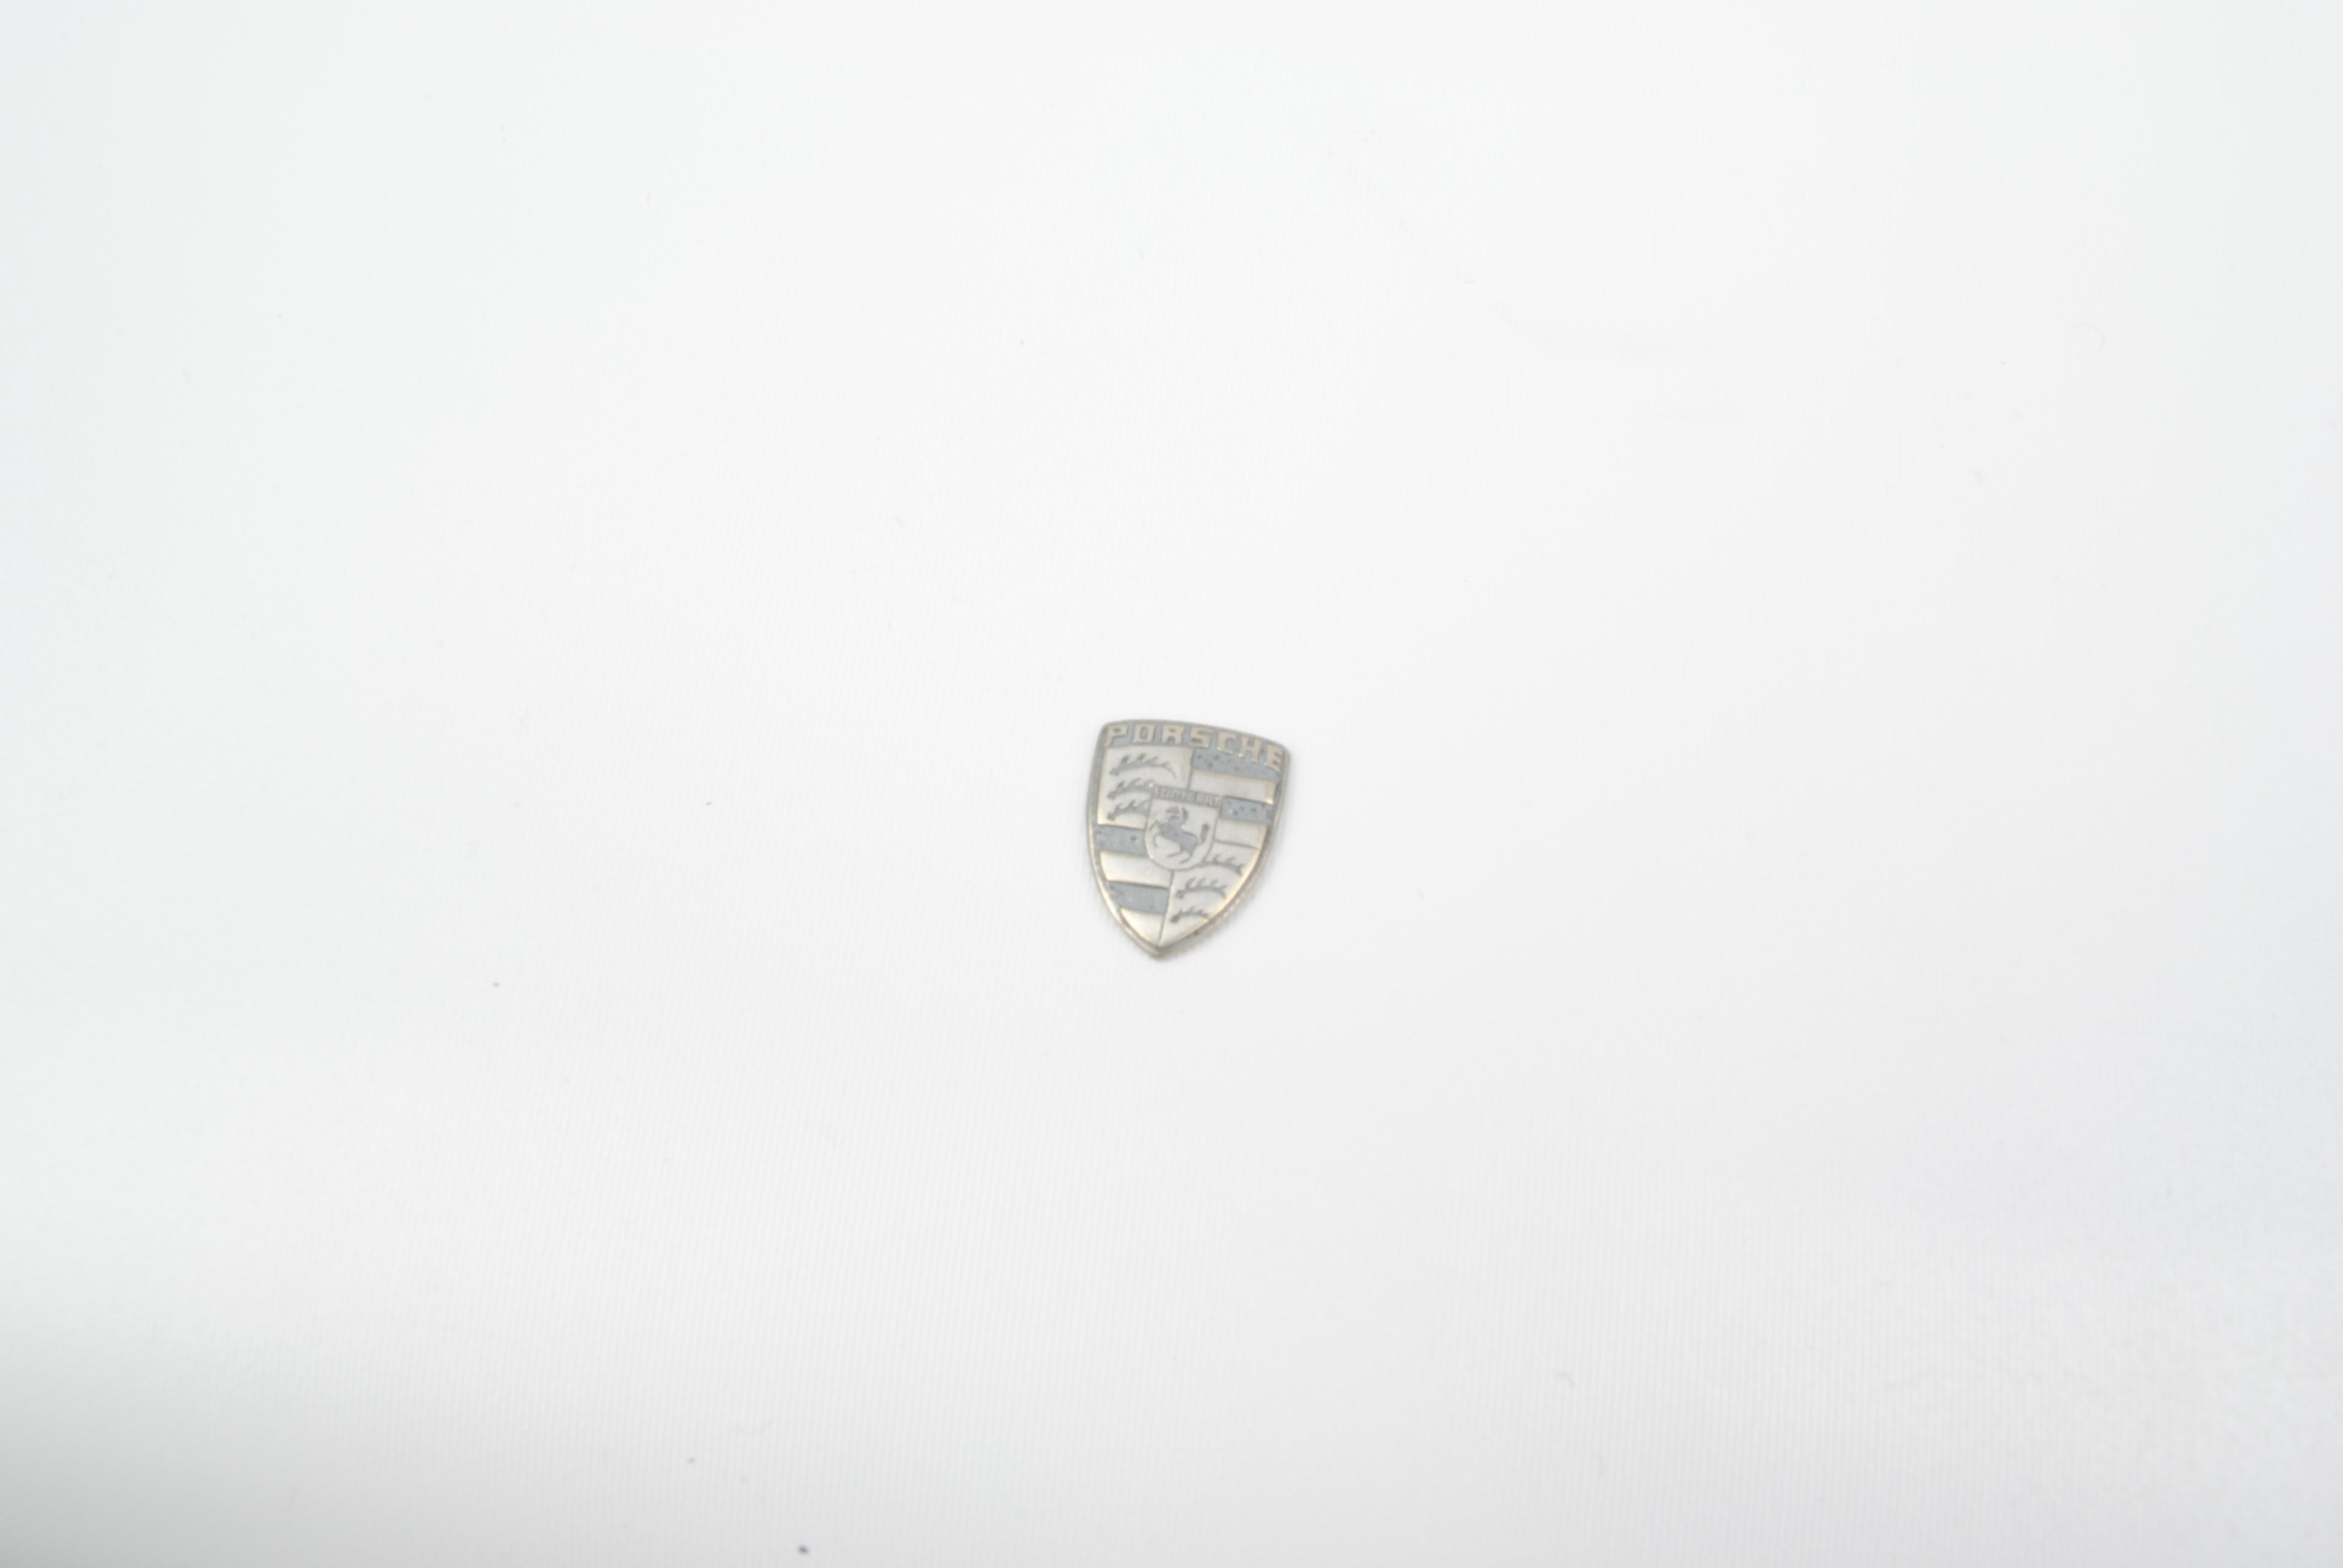 Porsche Key Fob Replacement Crest Emblem